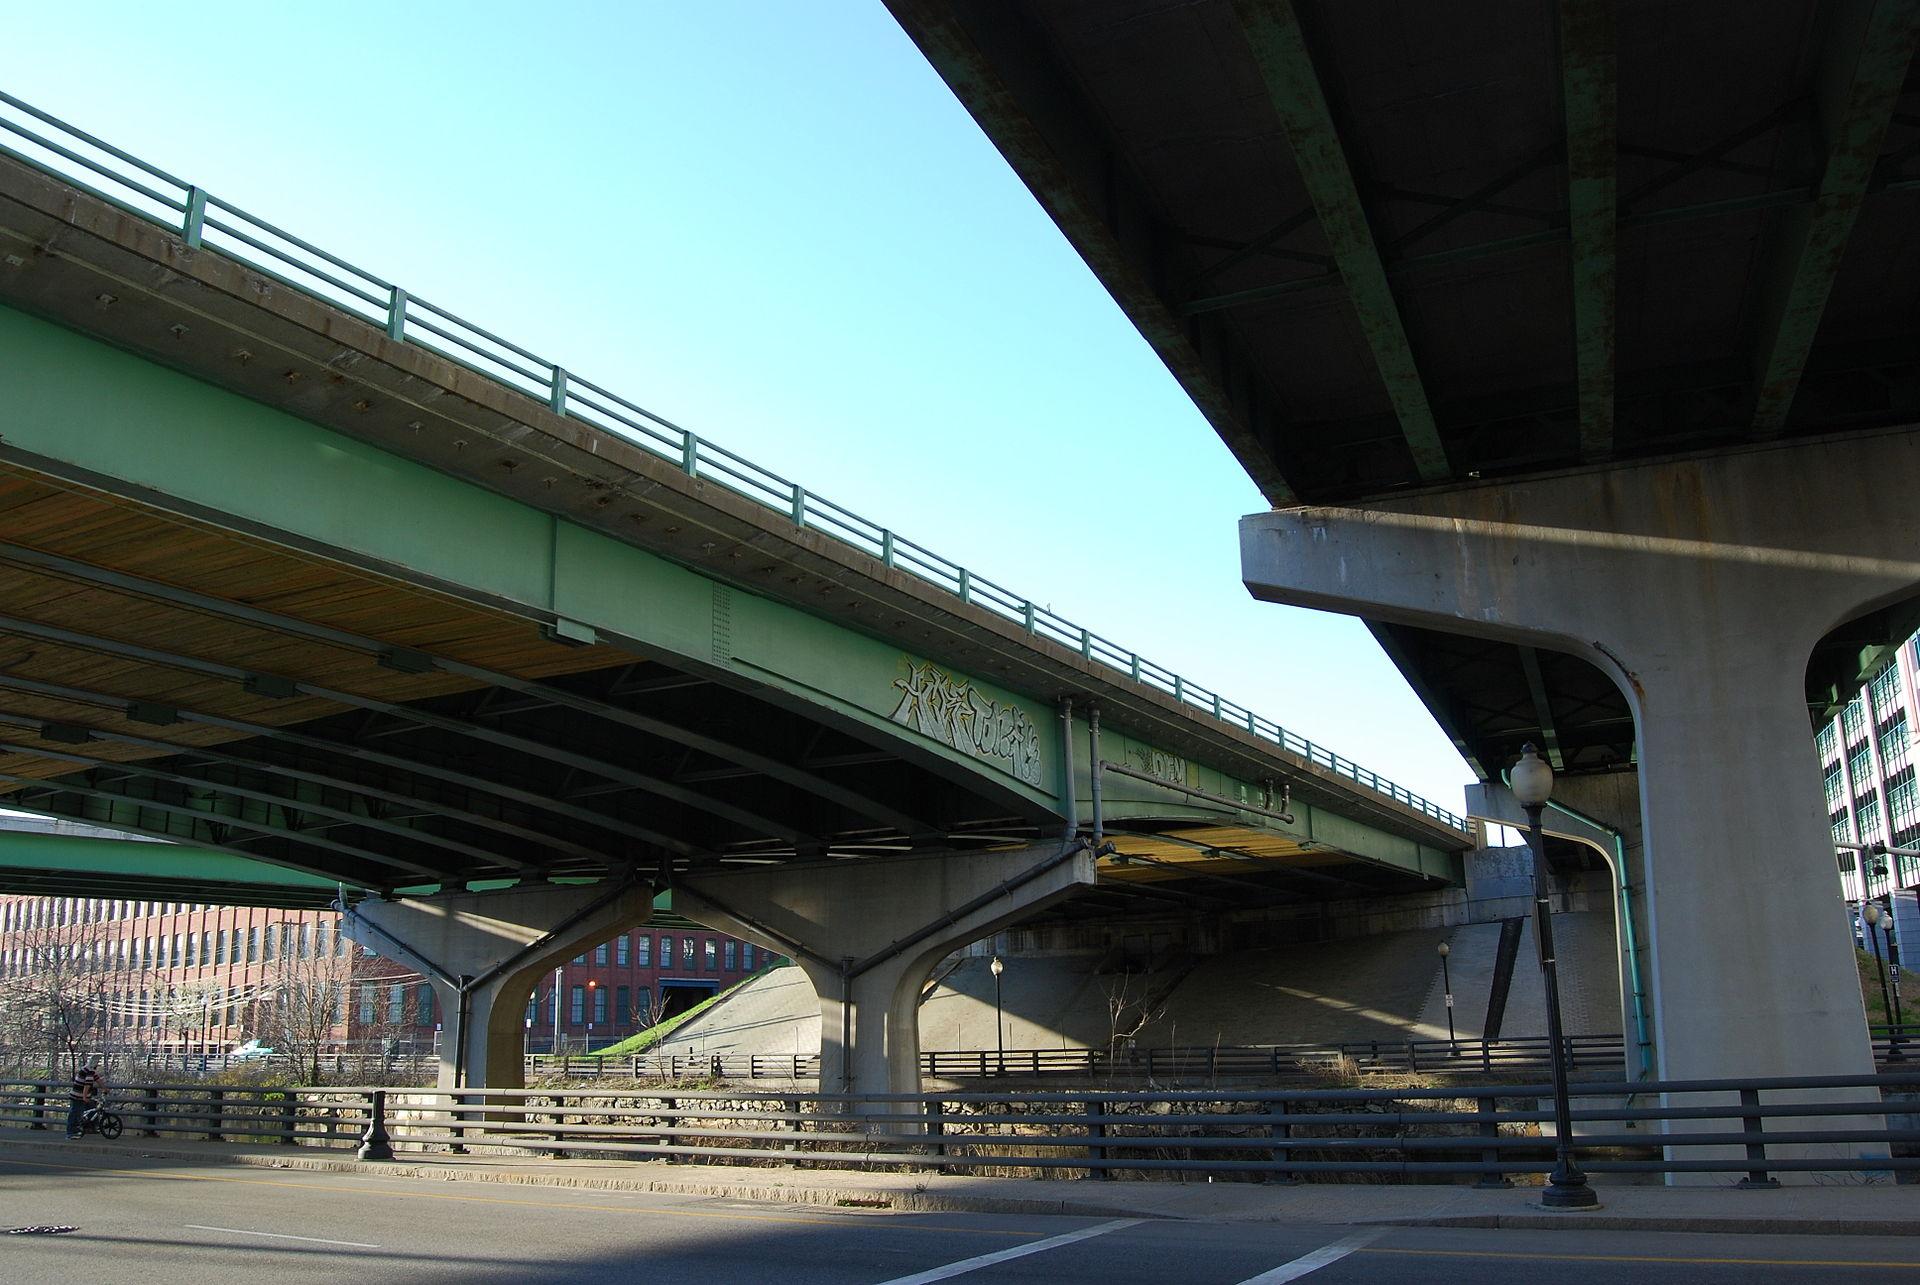 Interstate 95 bridge providence